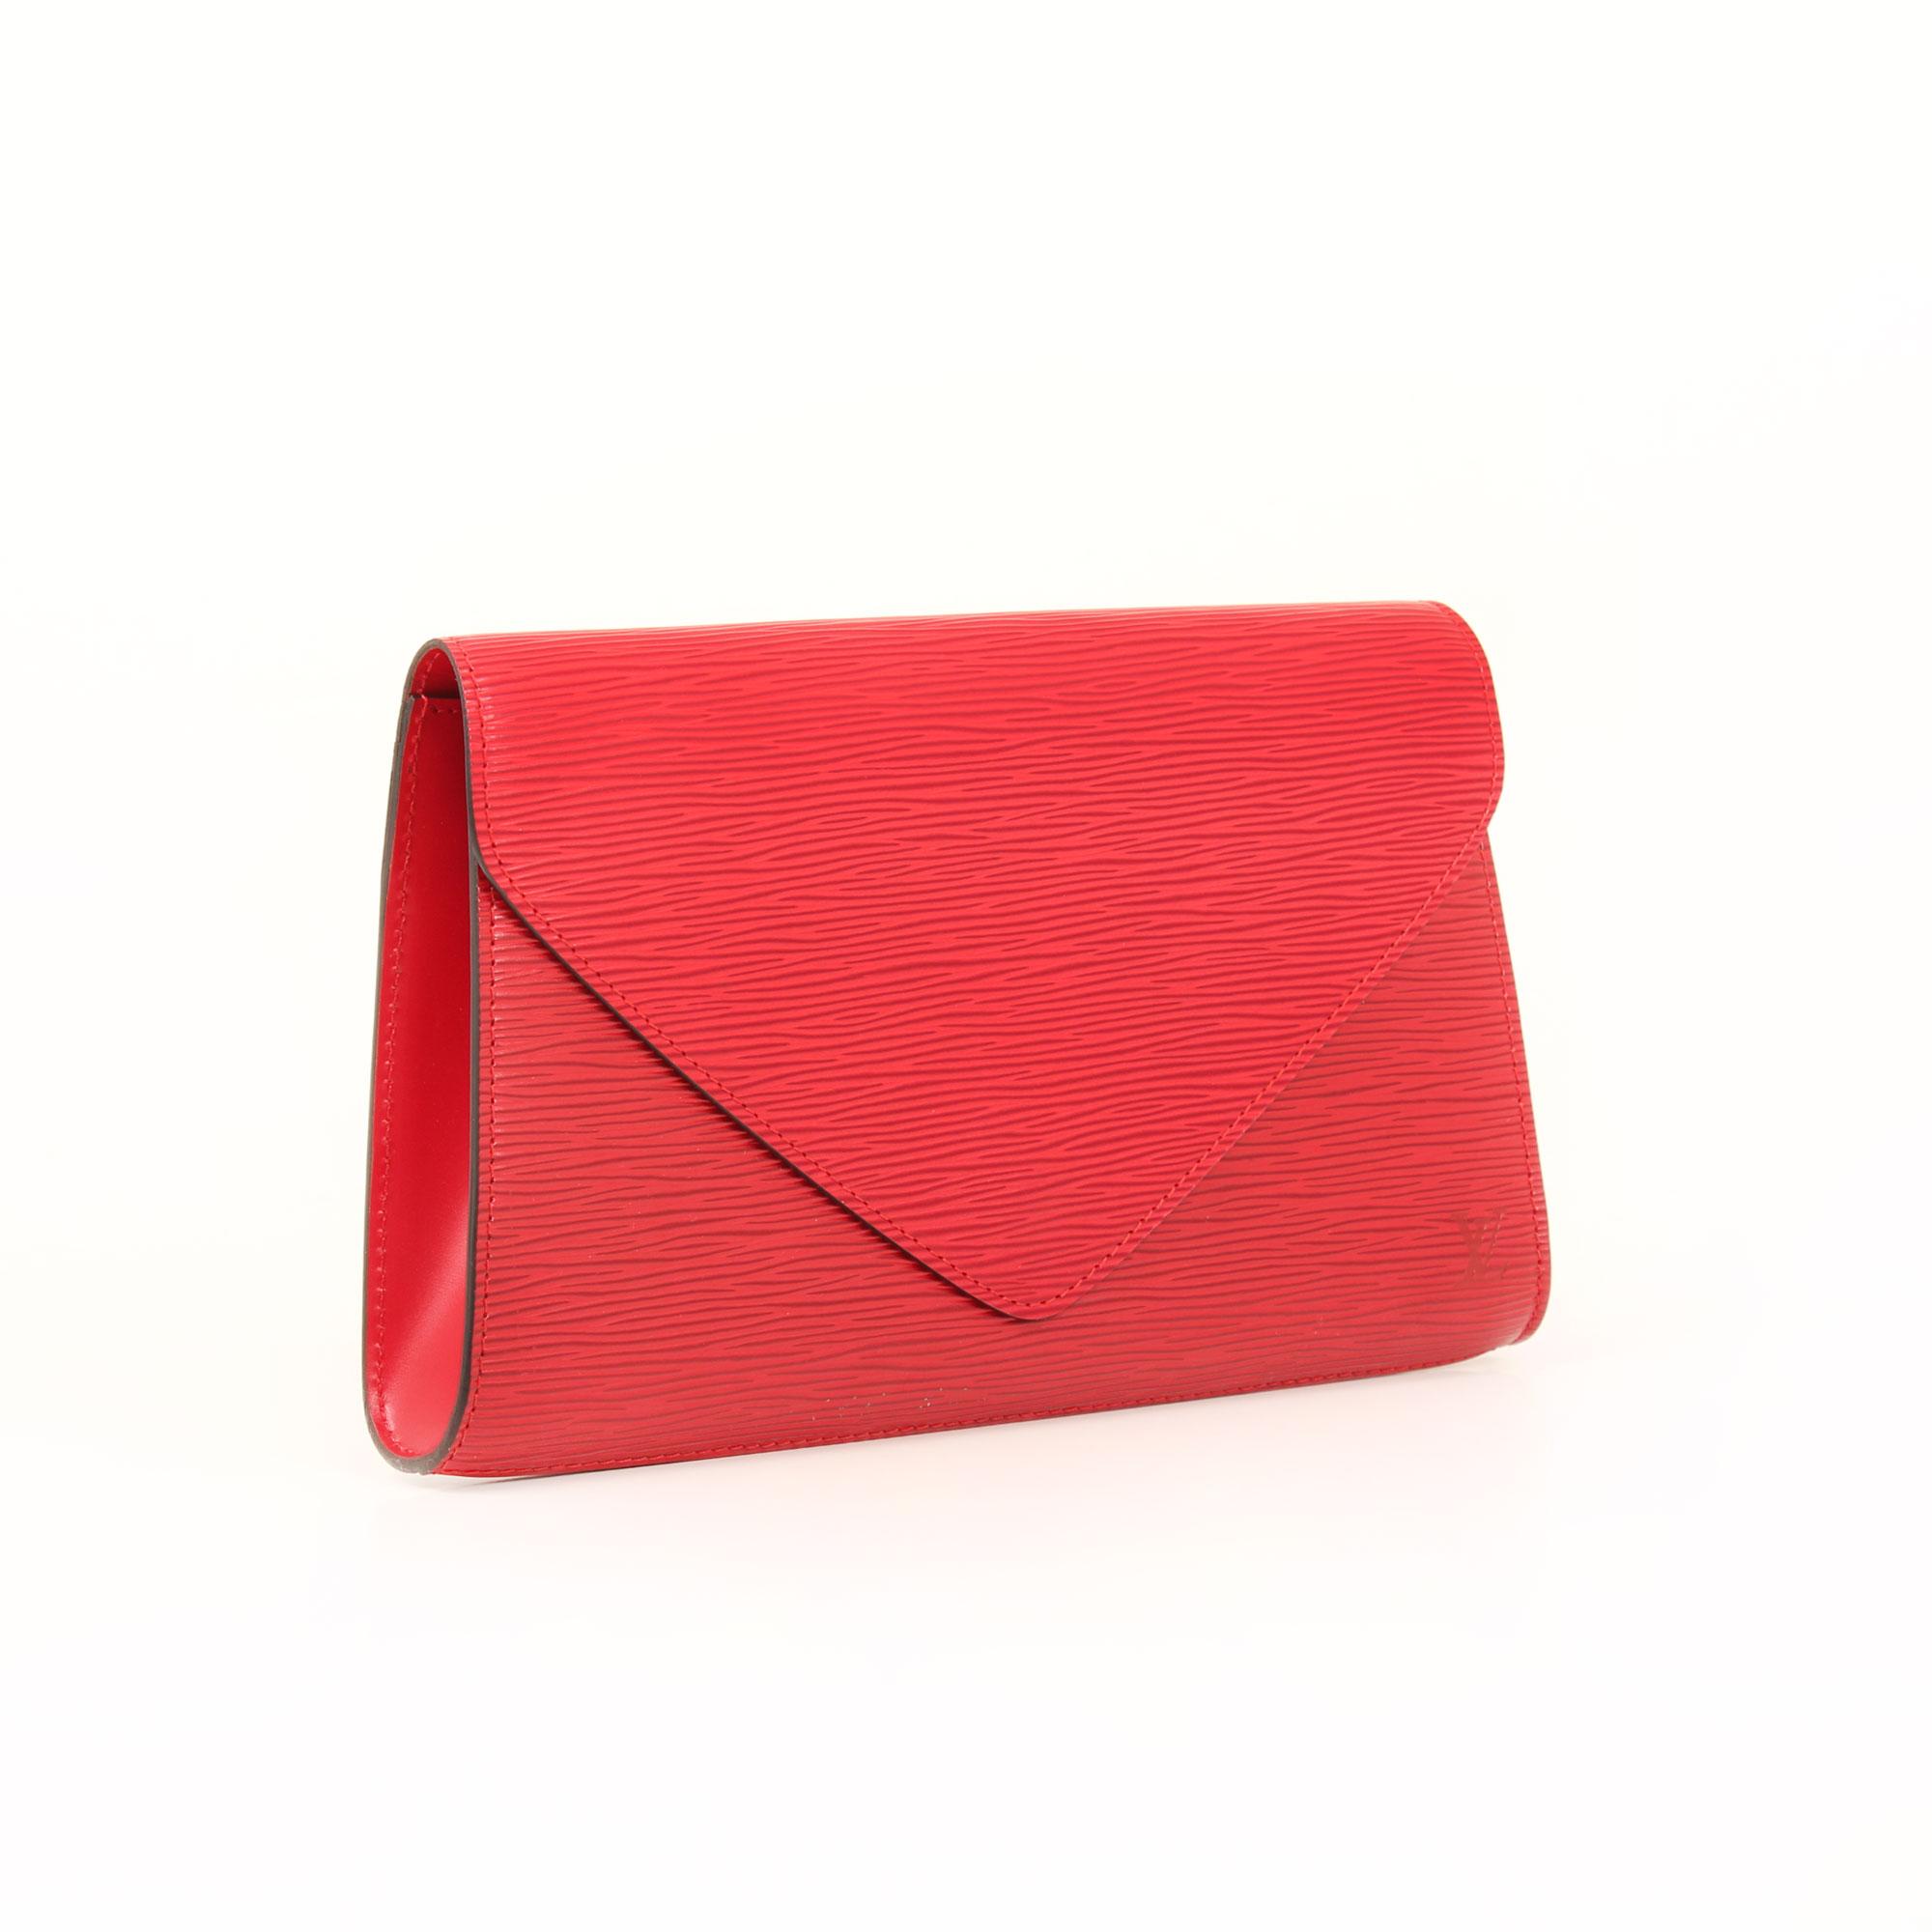 Imagen general del clutch louis vuitton vintage piel epi rojo